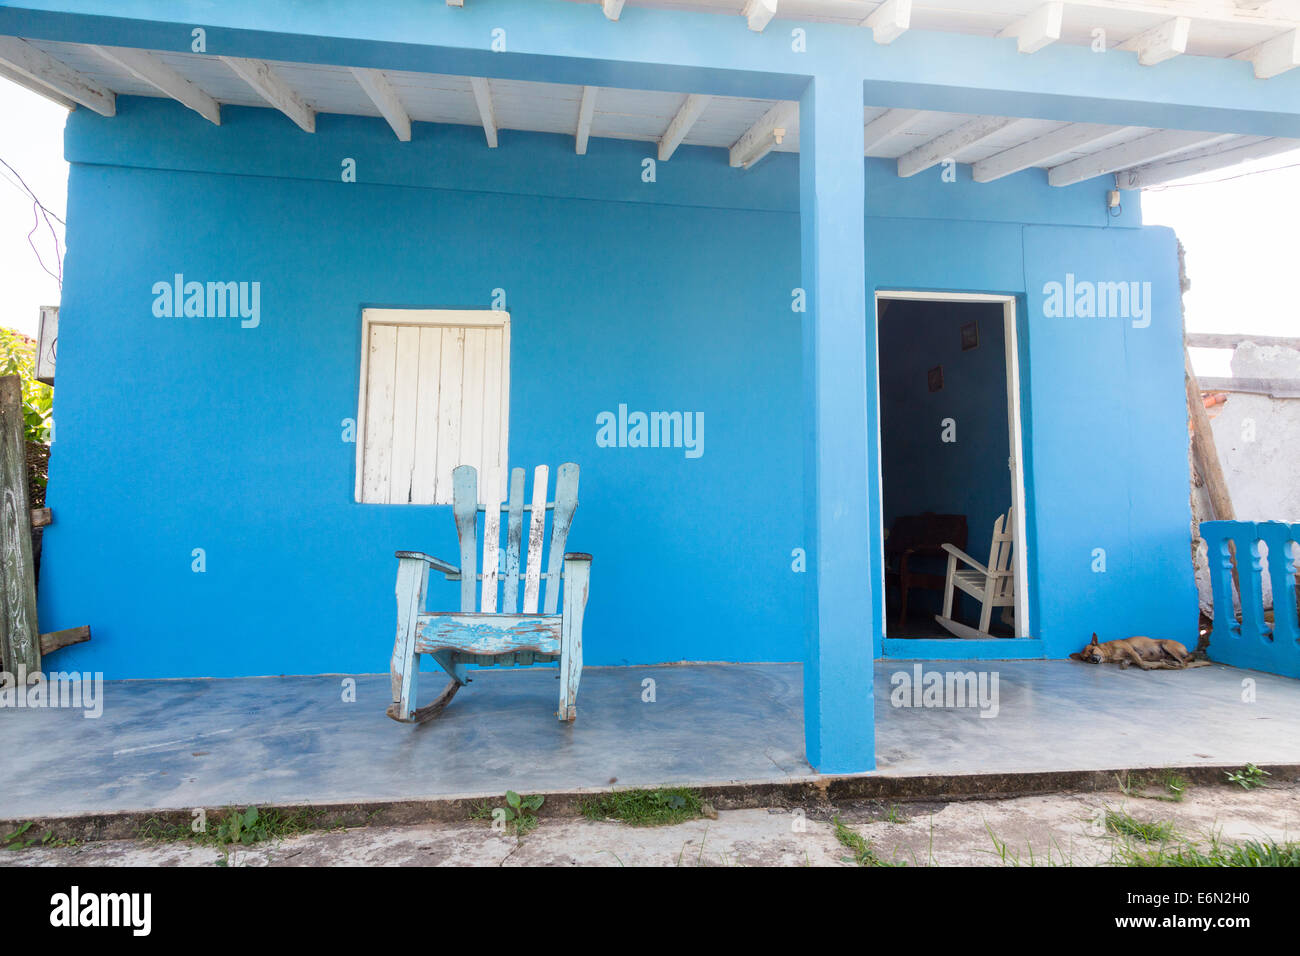 vinales cuba blue house stockfotos vinales cuba blue house bilder alamy. Black Bedroom Furniture Sets. Home Design Ideas